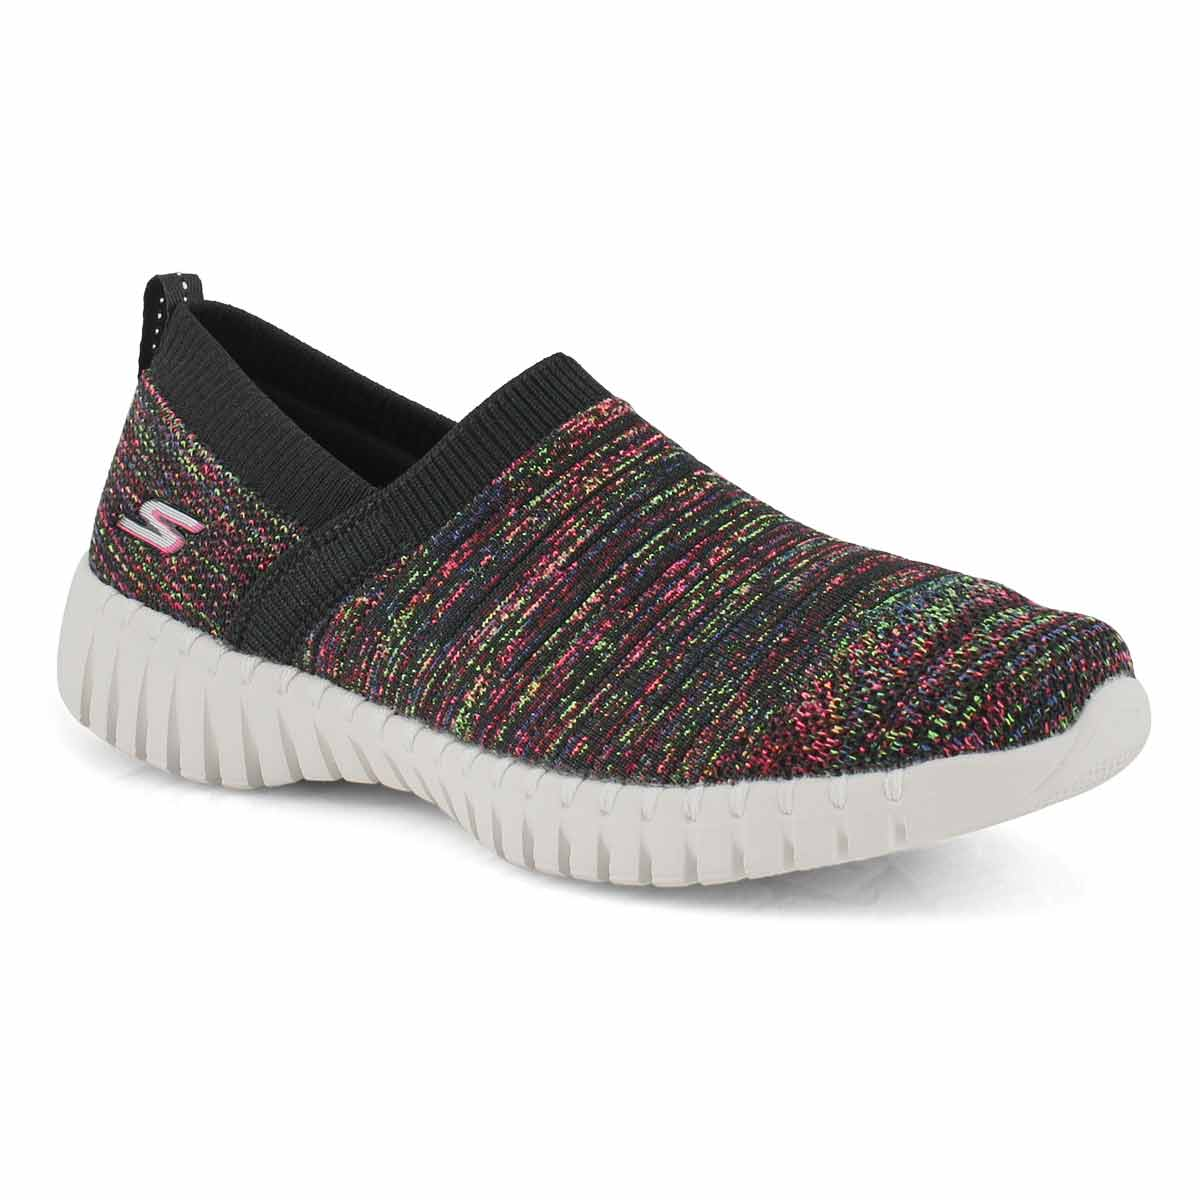 Women's GOwalk Eccentric Shoe - Black/Multi